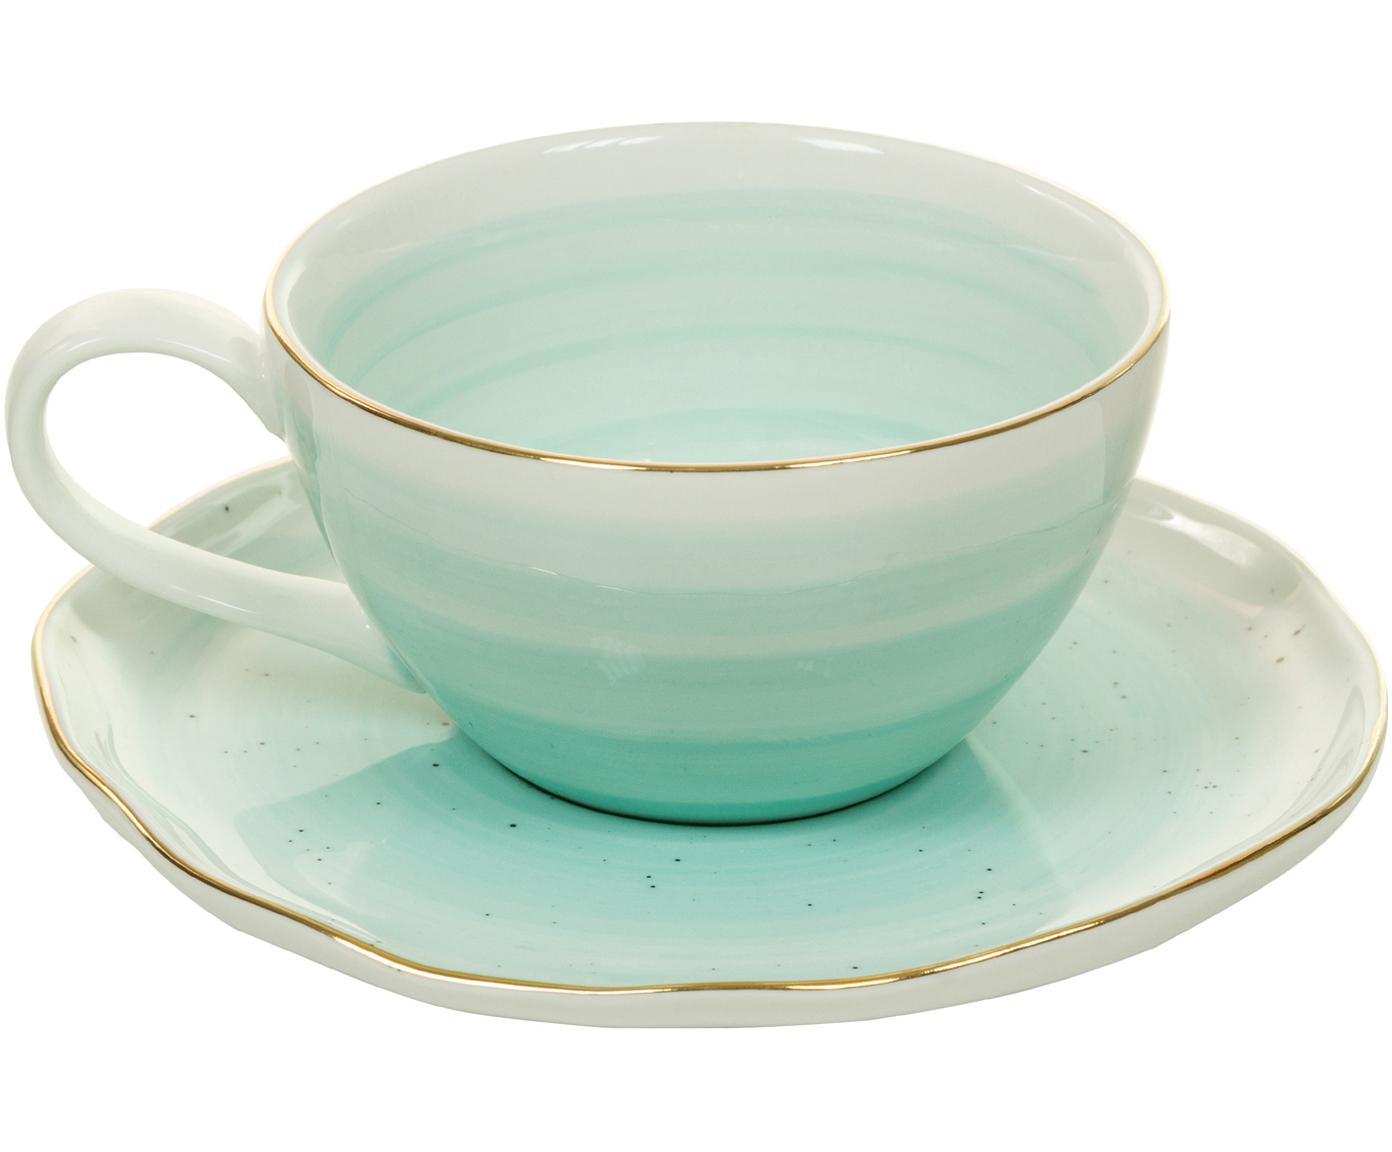 Handgemaakte kopjesset Bol, 4-delig, Porselein, Turquoiseblauw, Ø 10 x H 6 cm